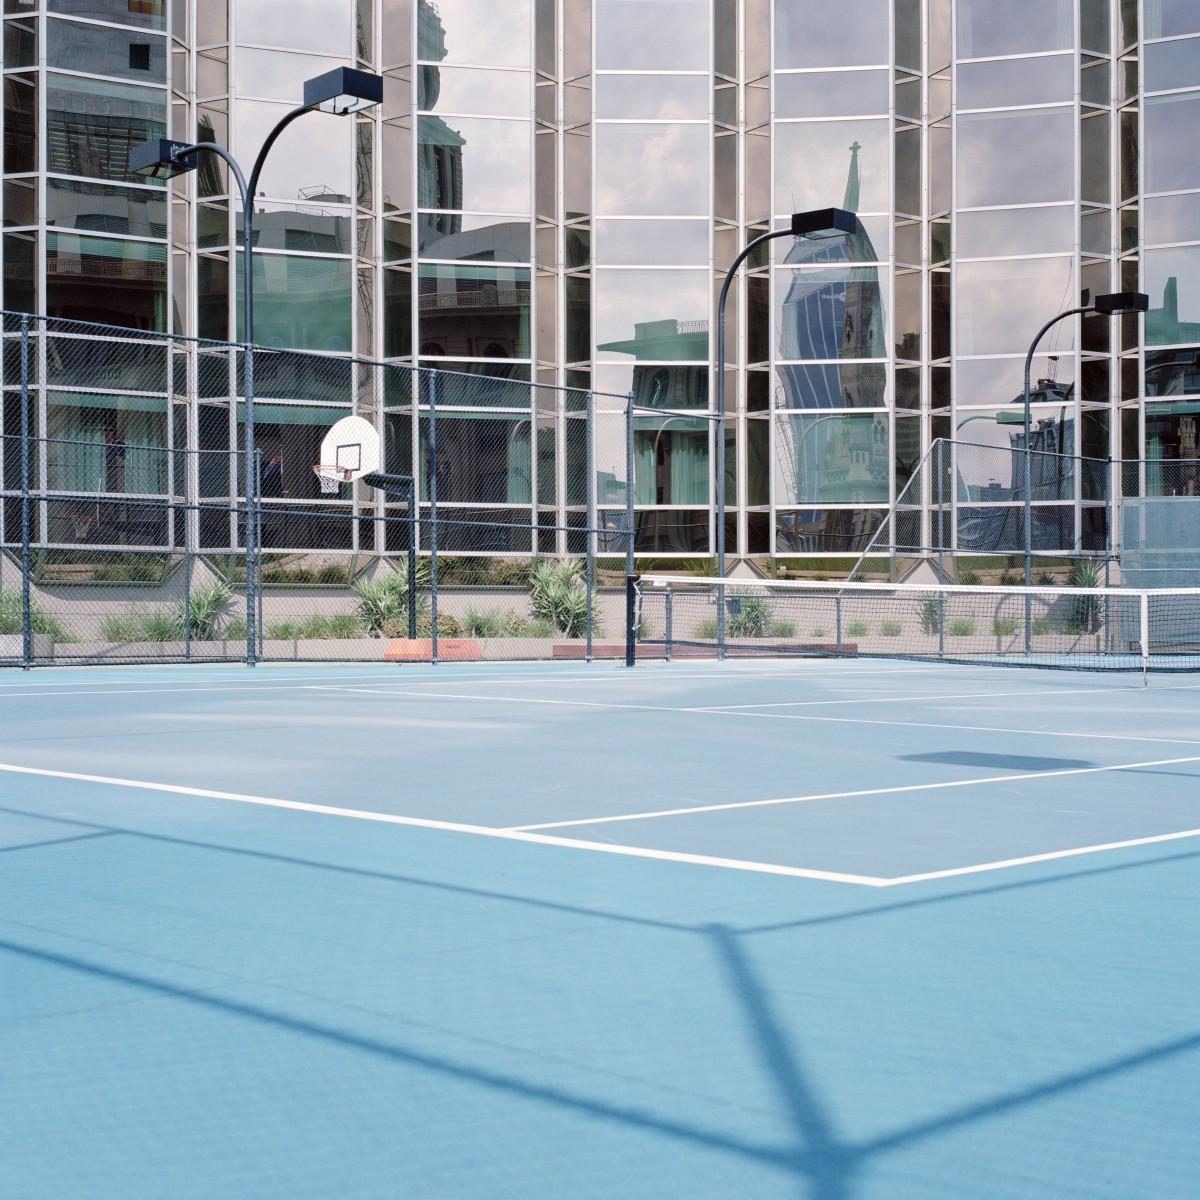 ward-roberts-courts-02.1-1113be4bfedd4258fb71c575893fc80d